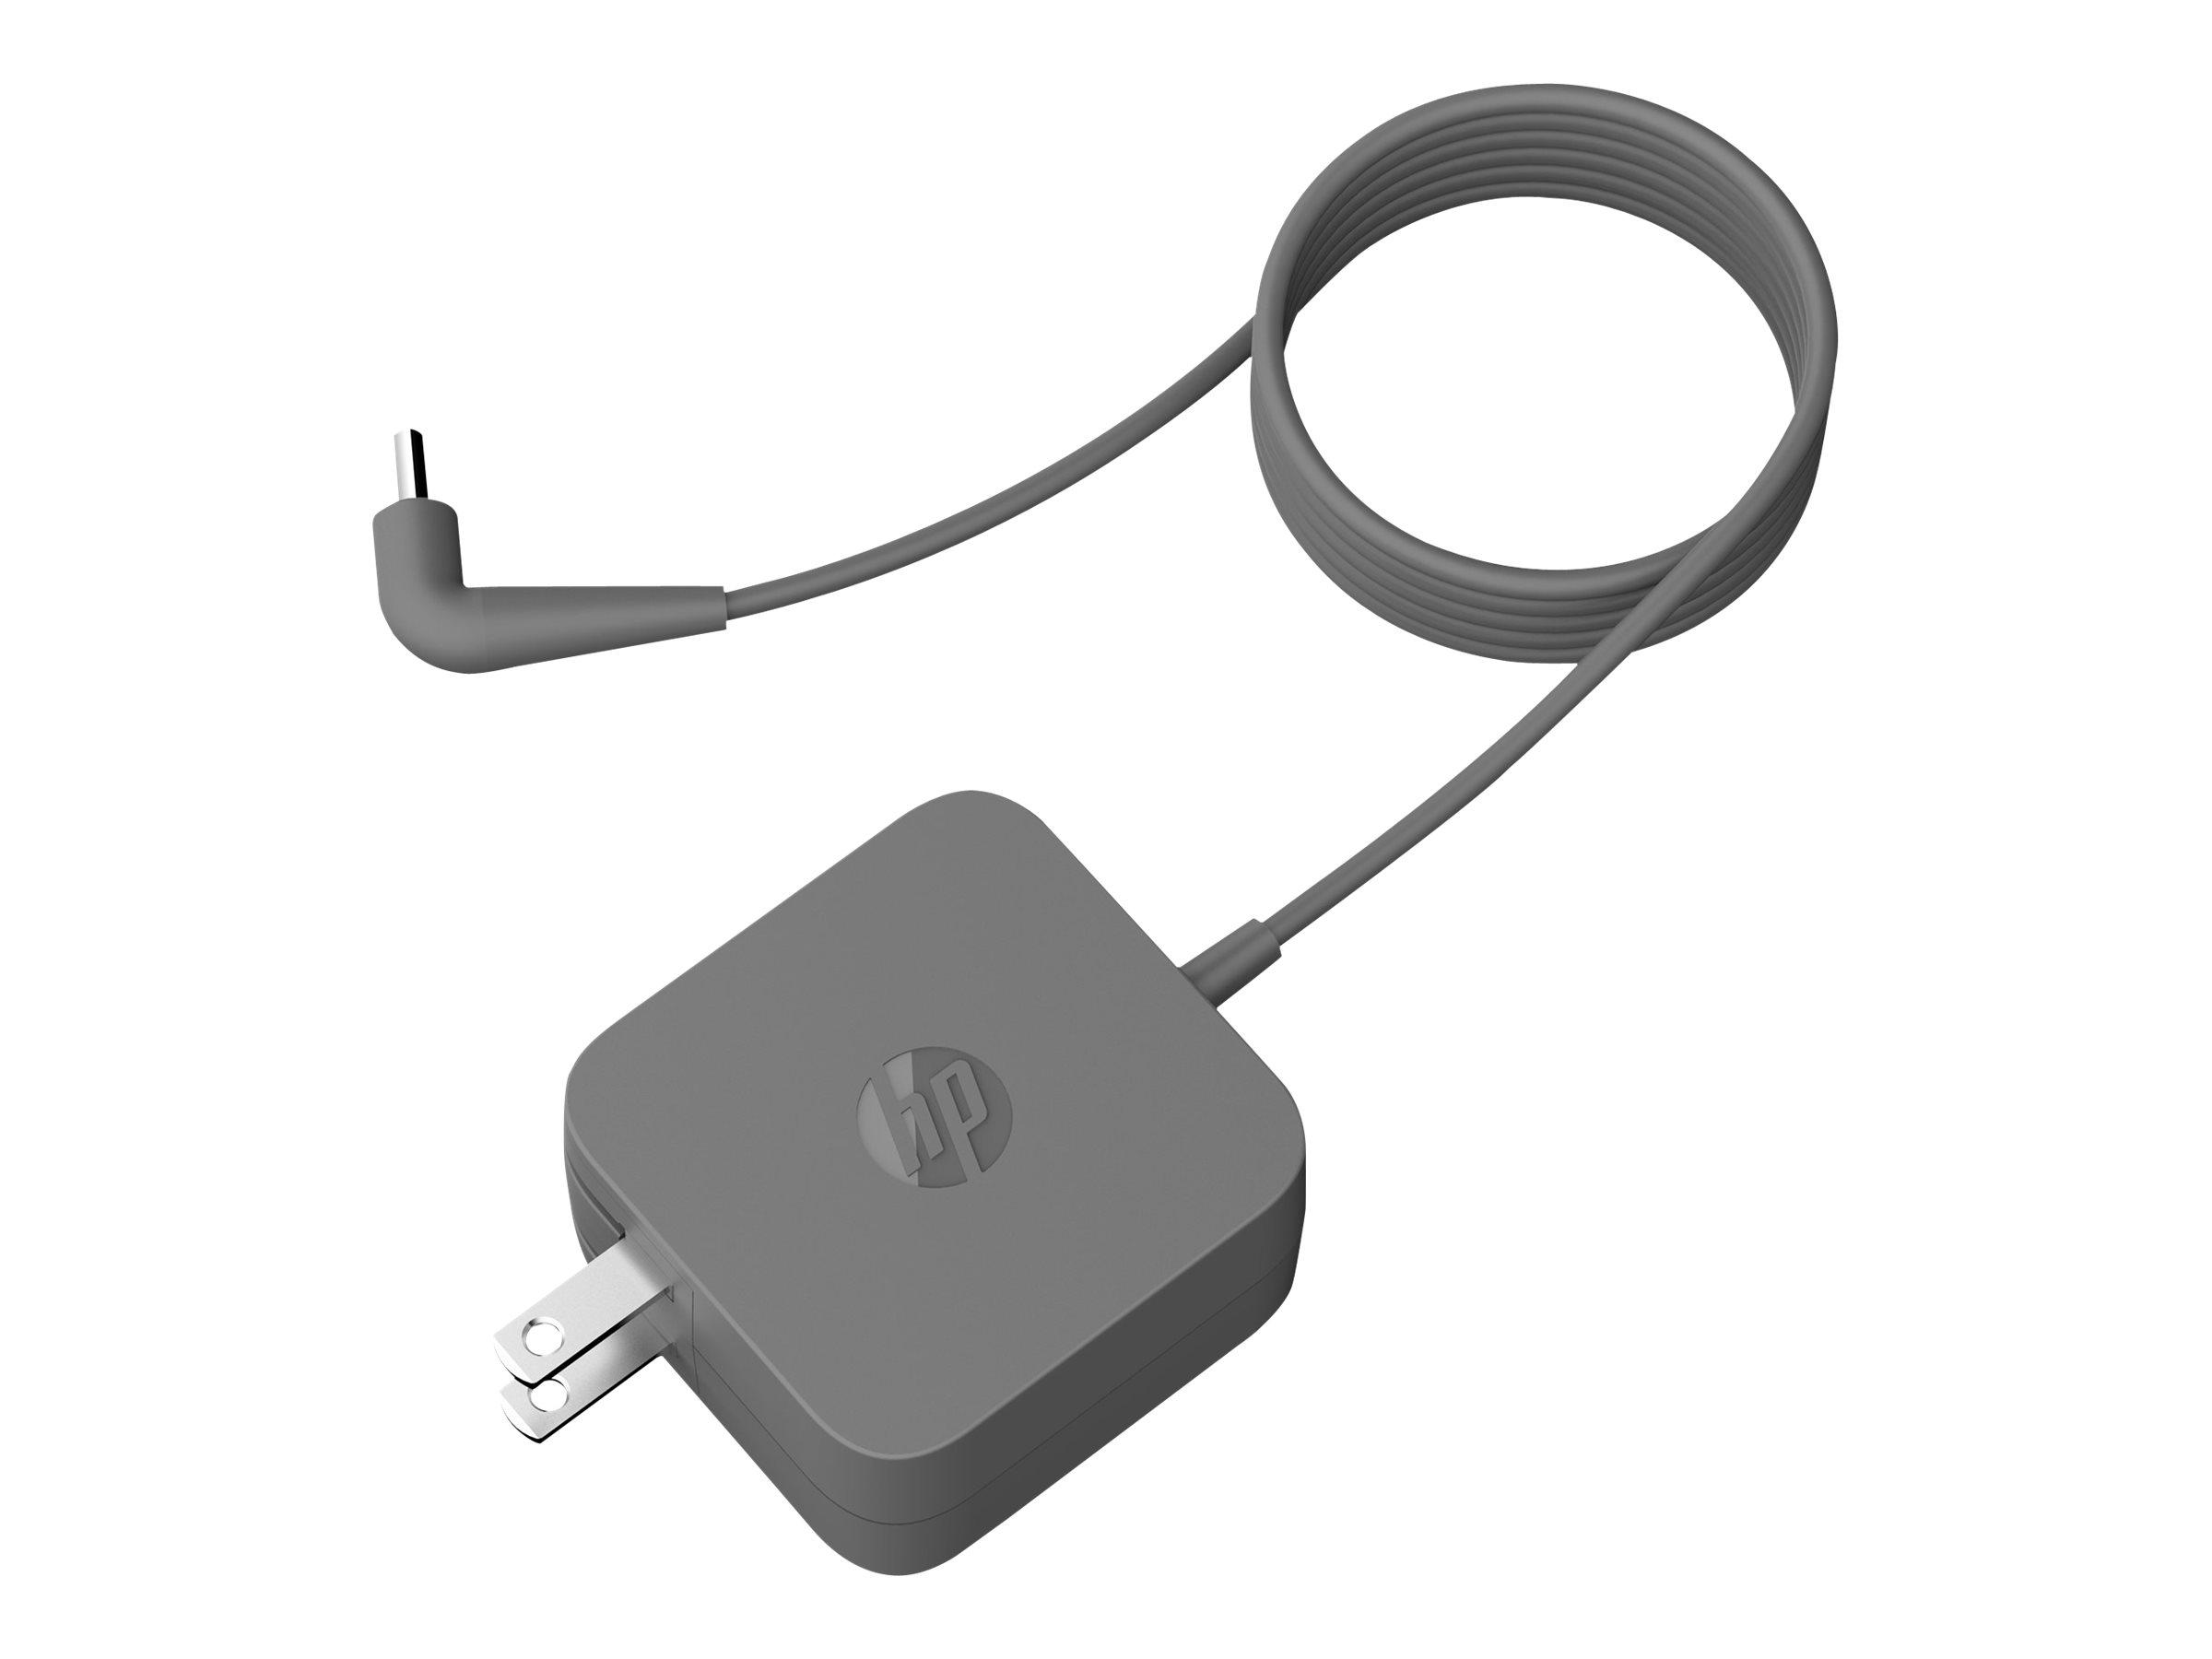 HP - Netzteil - 18 Watt - 1.5 A - Europa - für Pro Tablet 10 EE G1, 610 G1